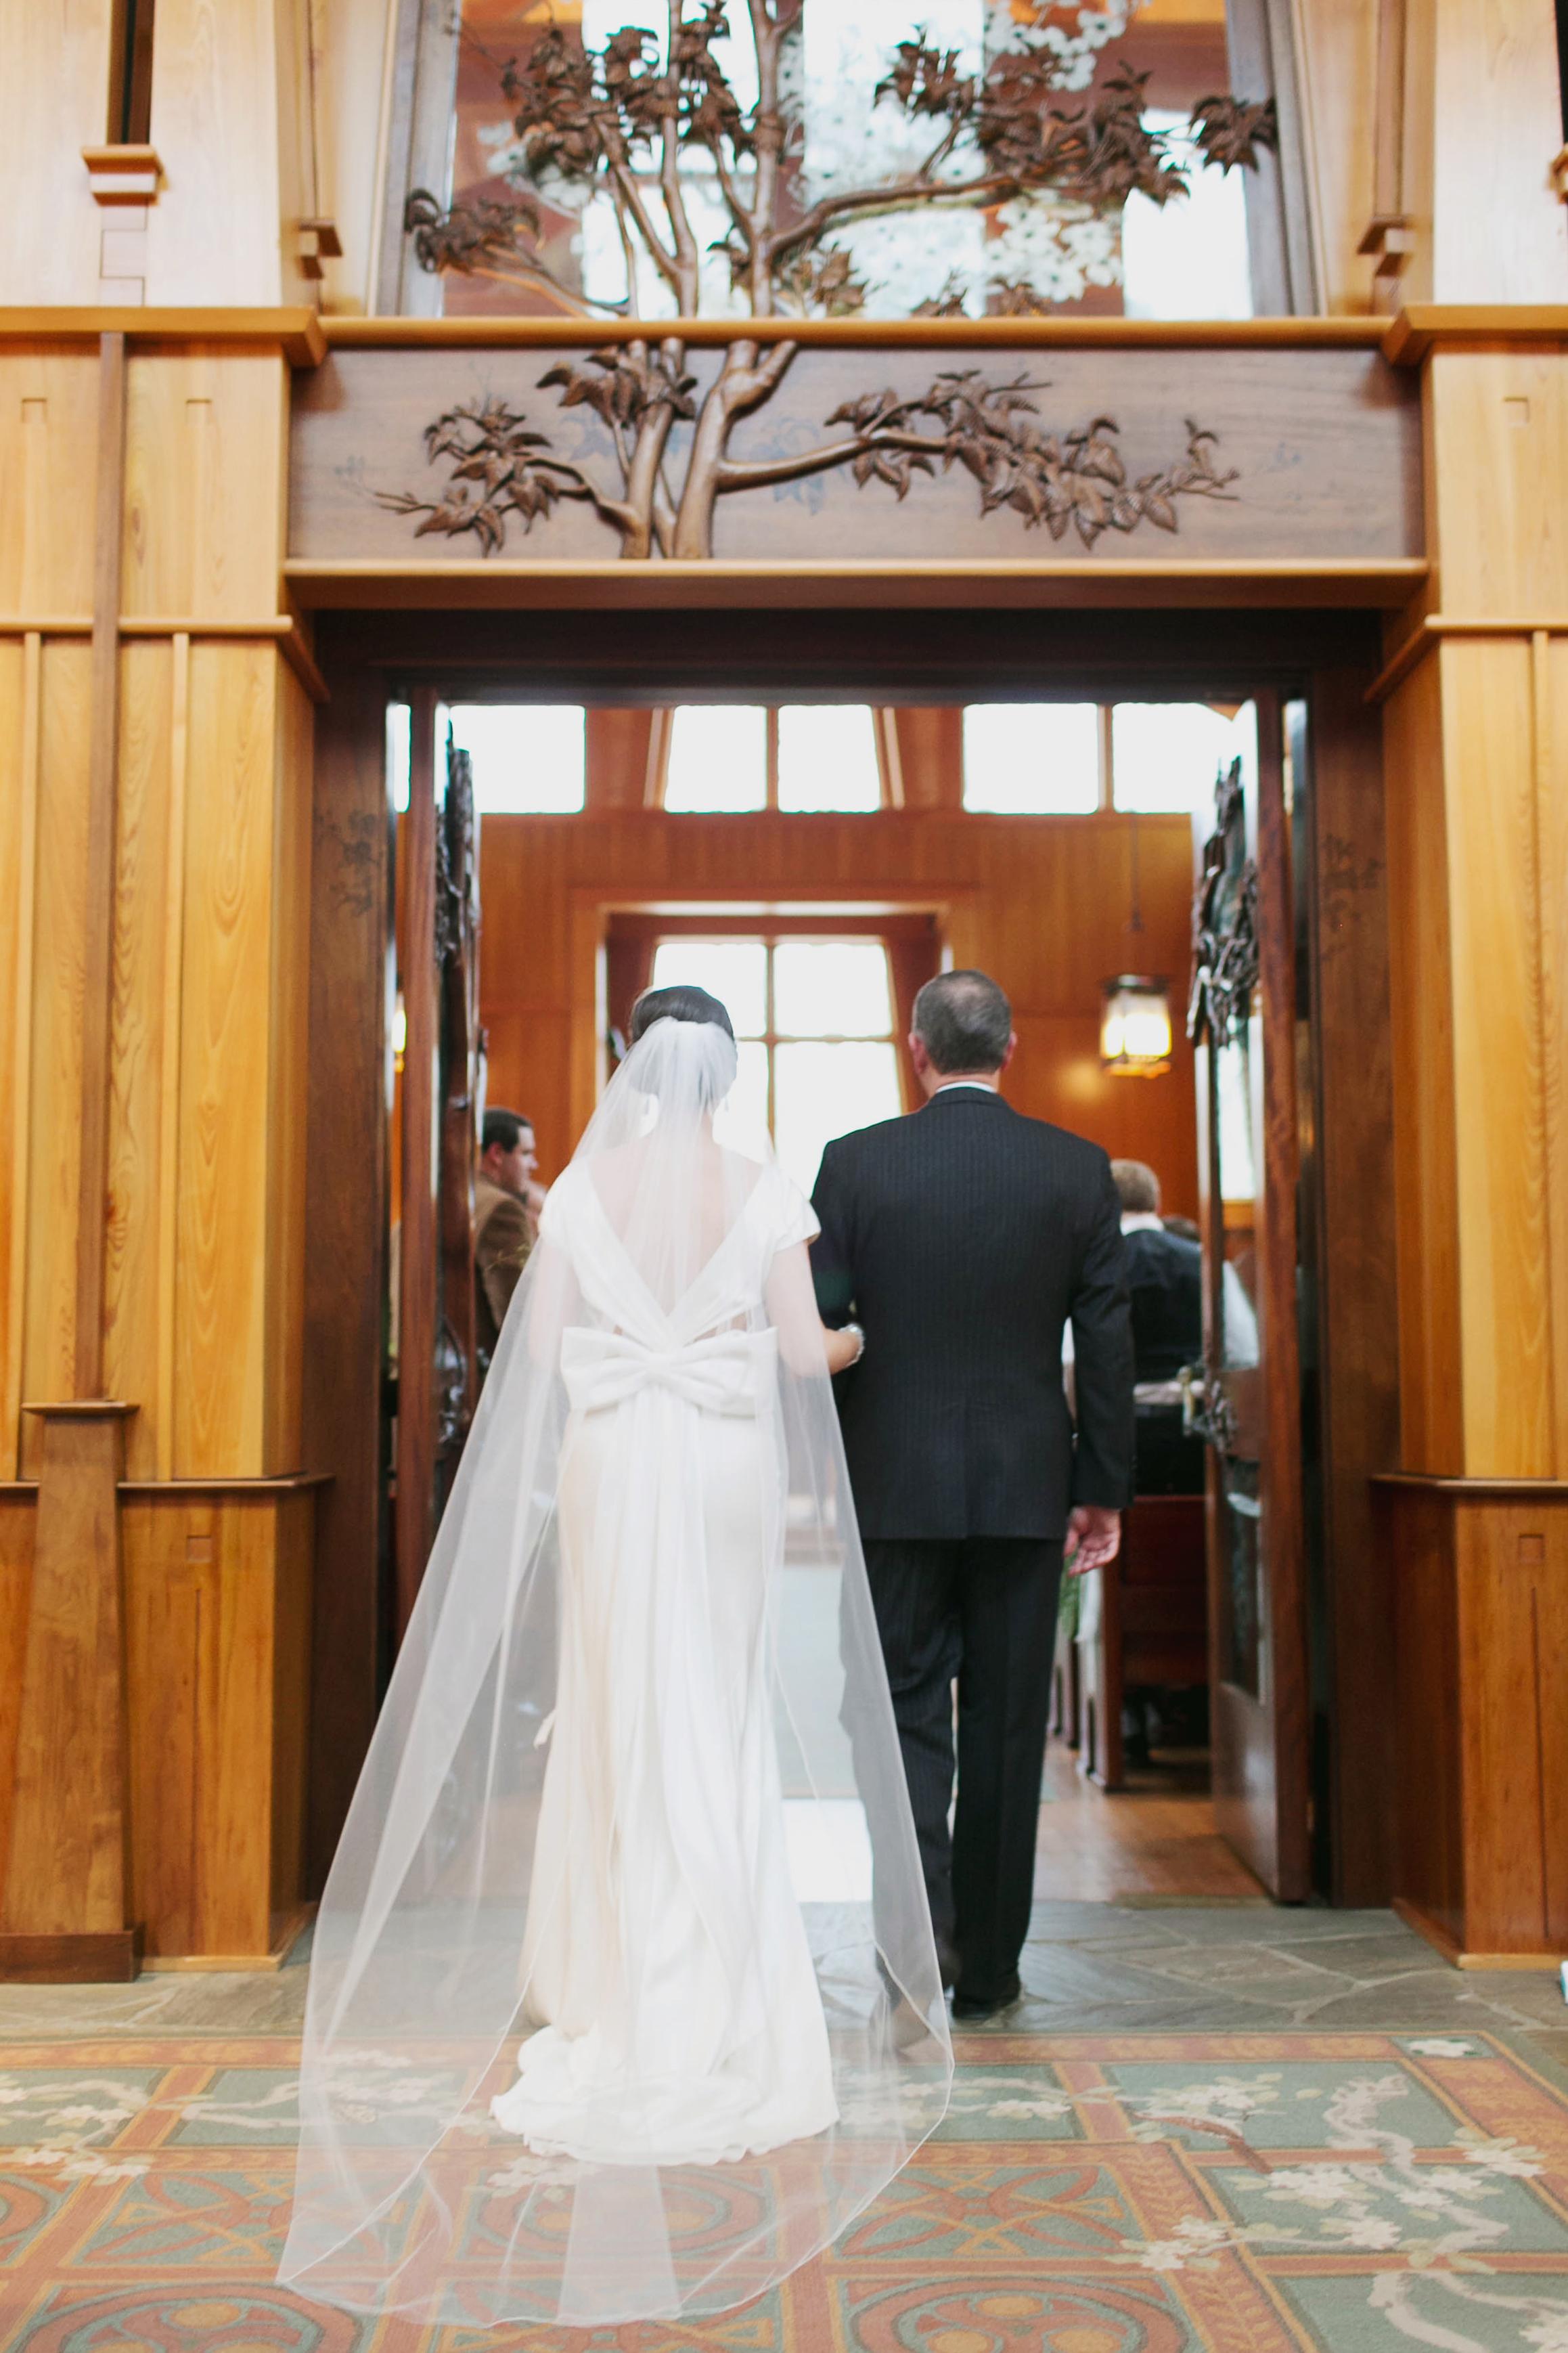 Simply-Charming-Socials_Atlanta-Wedding-Planner_Our-Labor-Of-Love_Emily-and-Jon_16.jpg